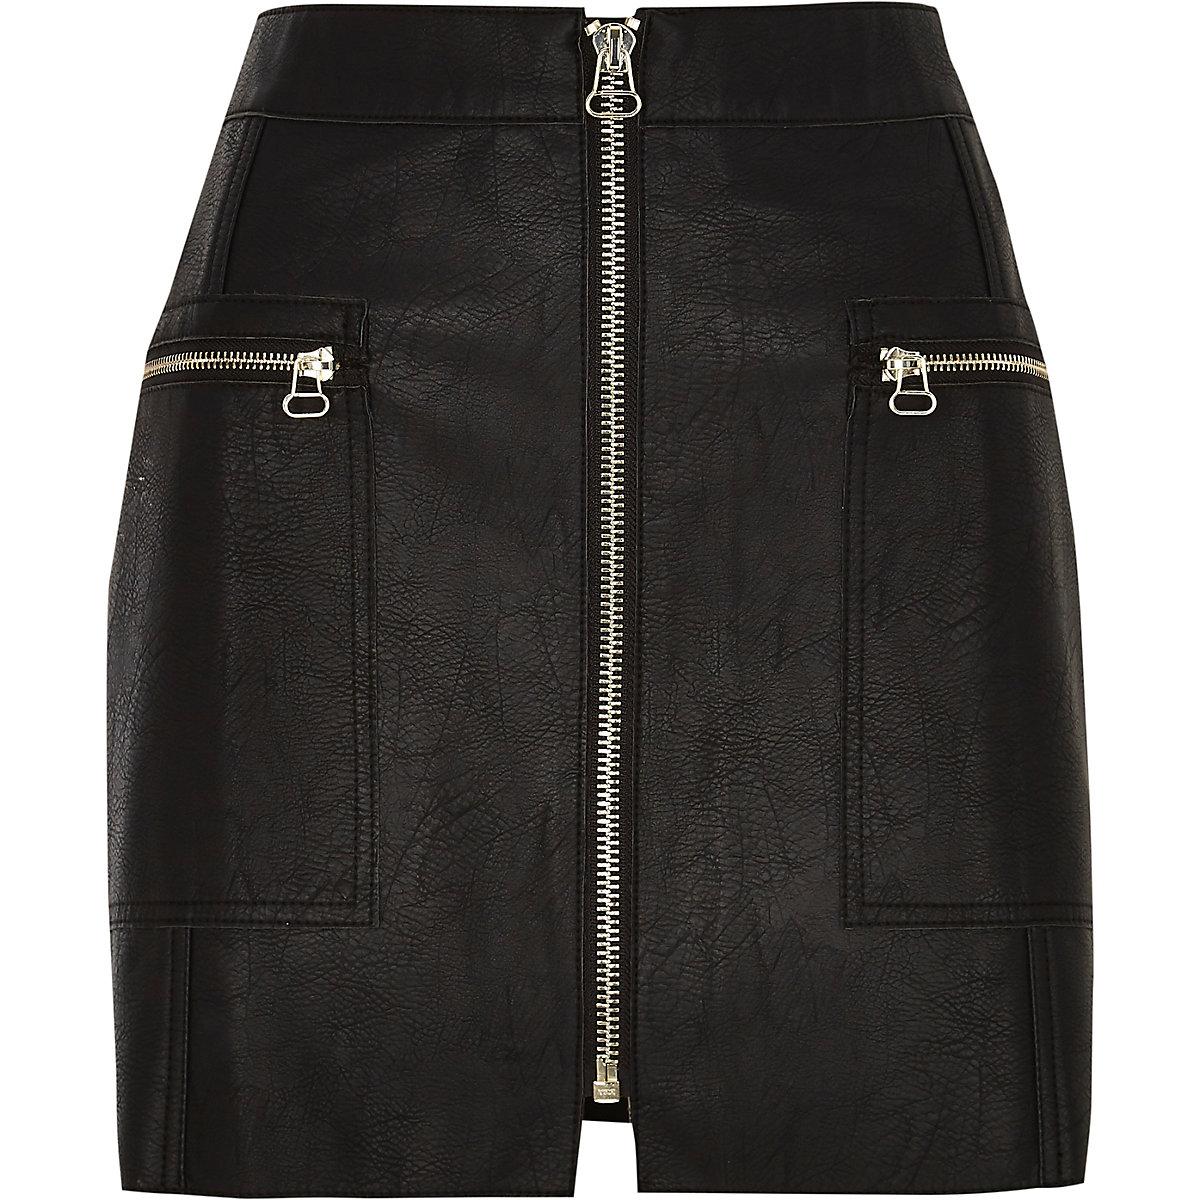 Petite black leather zip front mini skirt